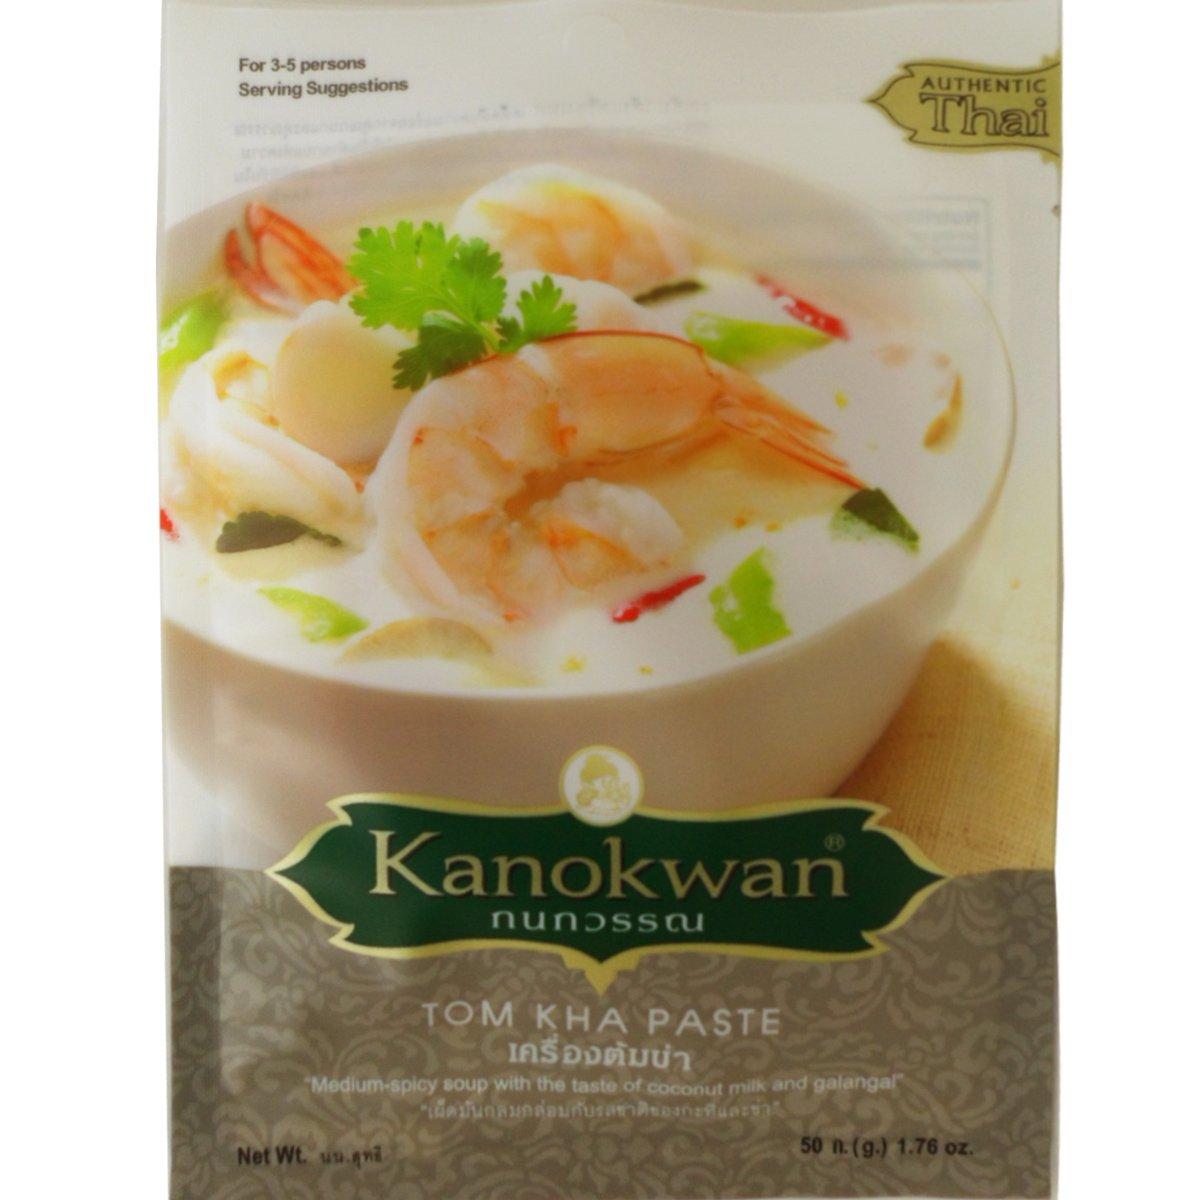 Tom Kha Curry Paste Thai Authentic Herbal Food Net Wt 50 G (1.76 Oz.) Kanokwan Brand X 10 Bags